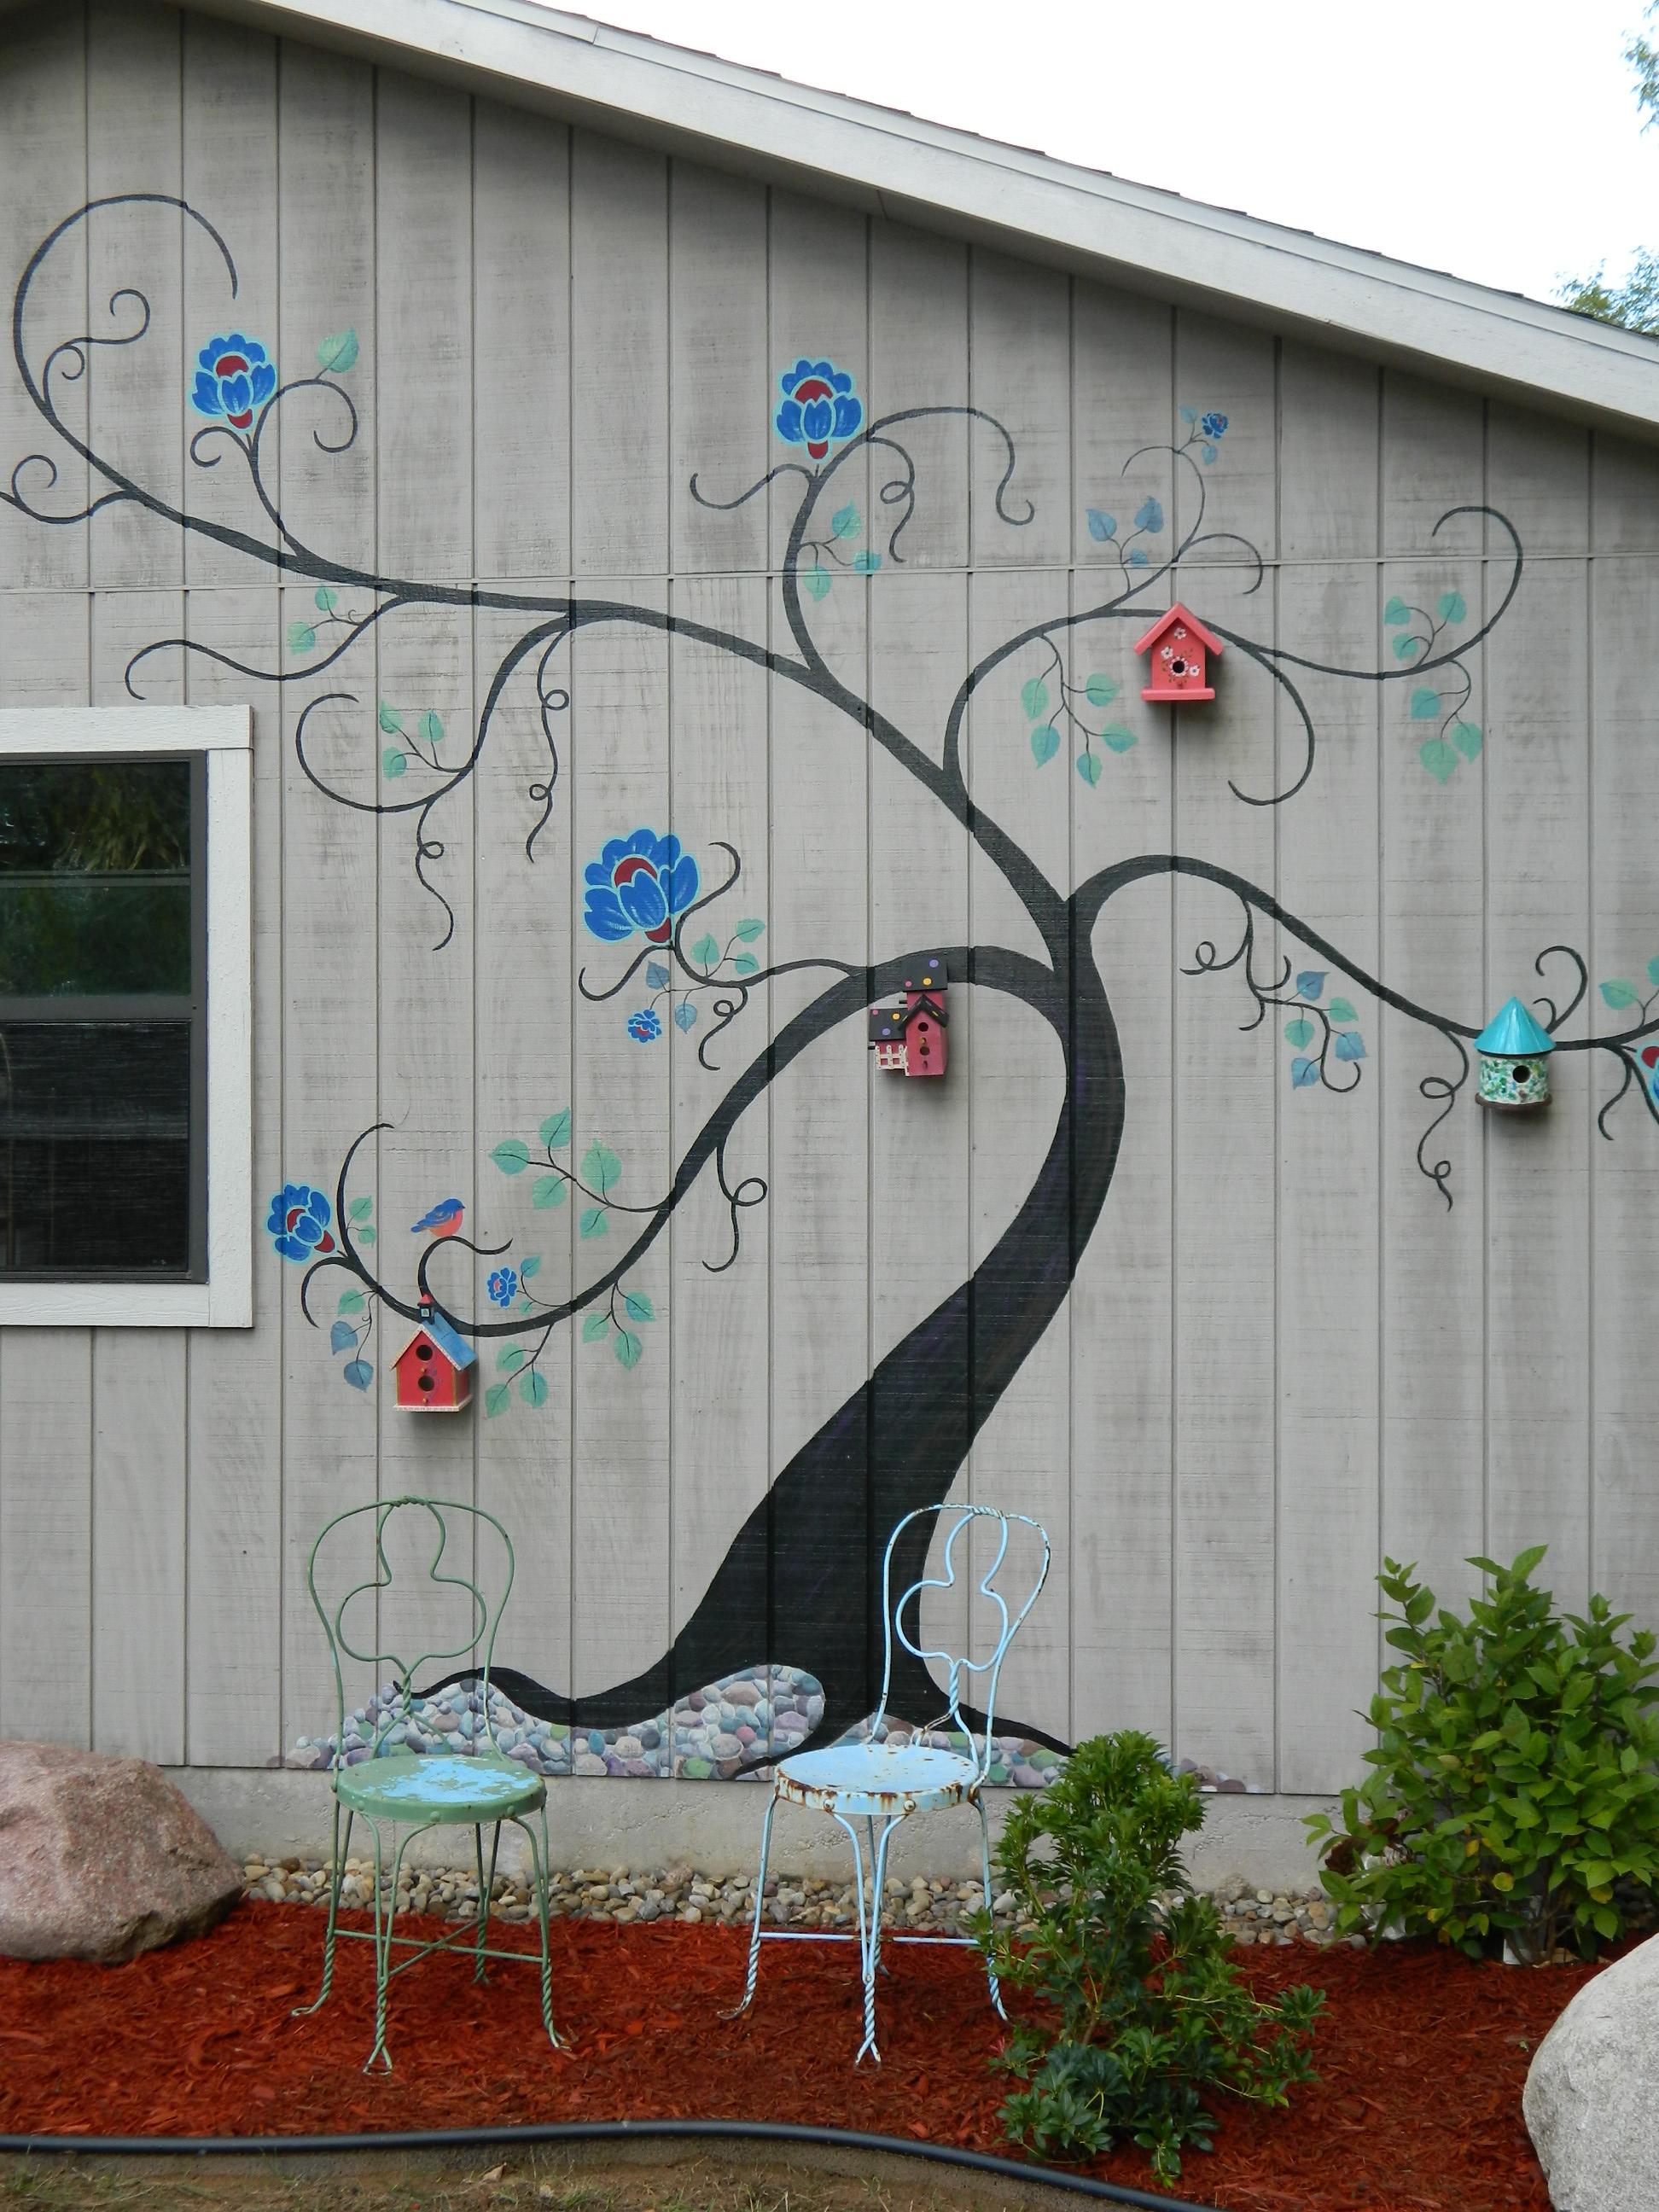 Рисунок на внешней стене